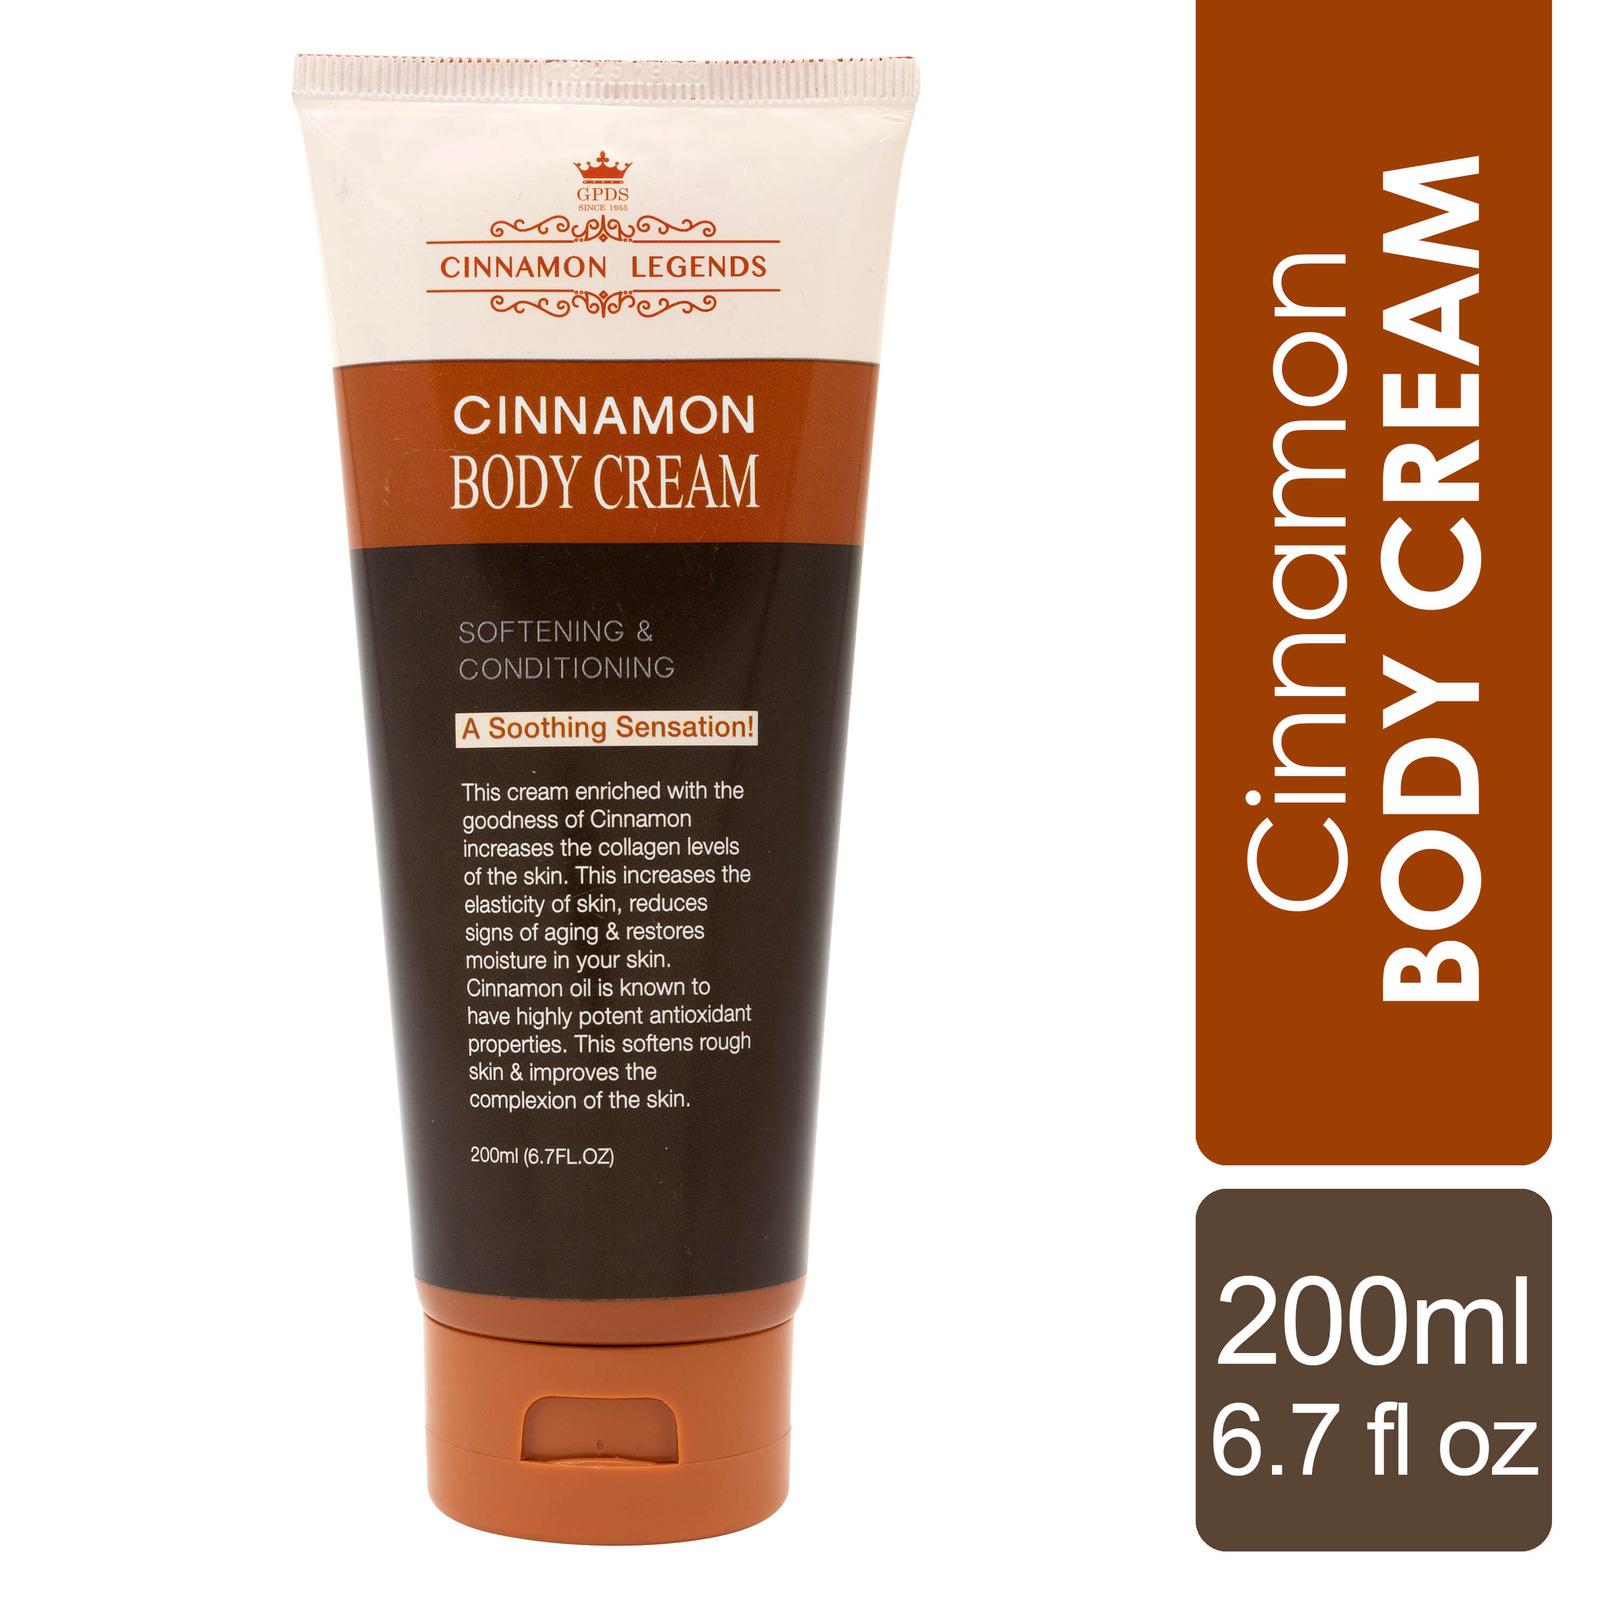 Cinnamon Legends Cinnamon Body Cream 200 ml / 6.7 fl oz